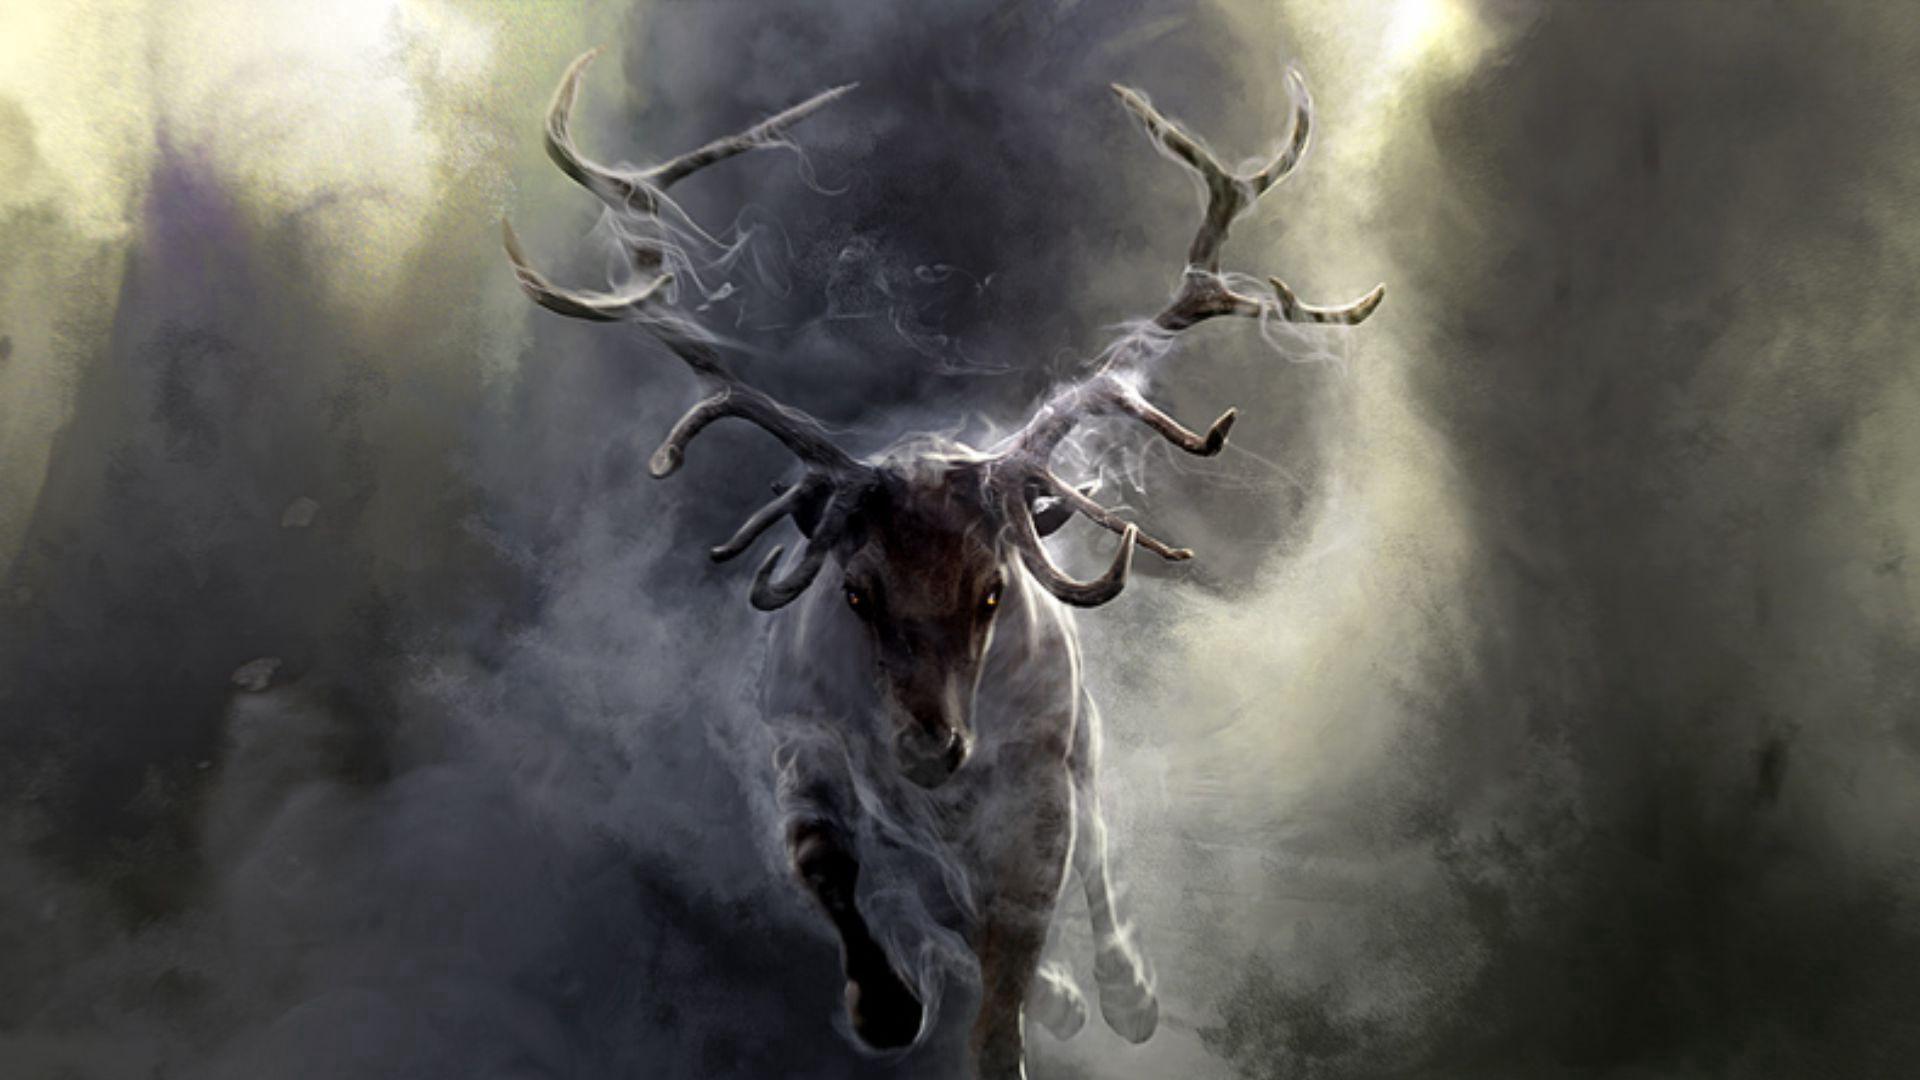 155805 download wallpaper Fantasy, Deer, Run, Running, Horns, Smoke screensavers and pictures for free